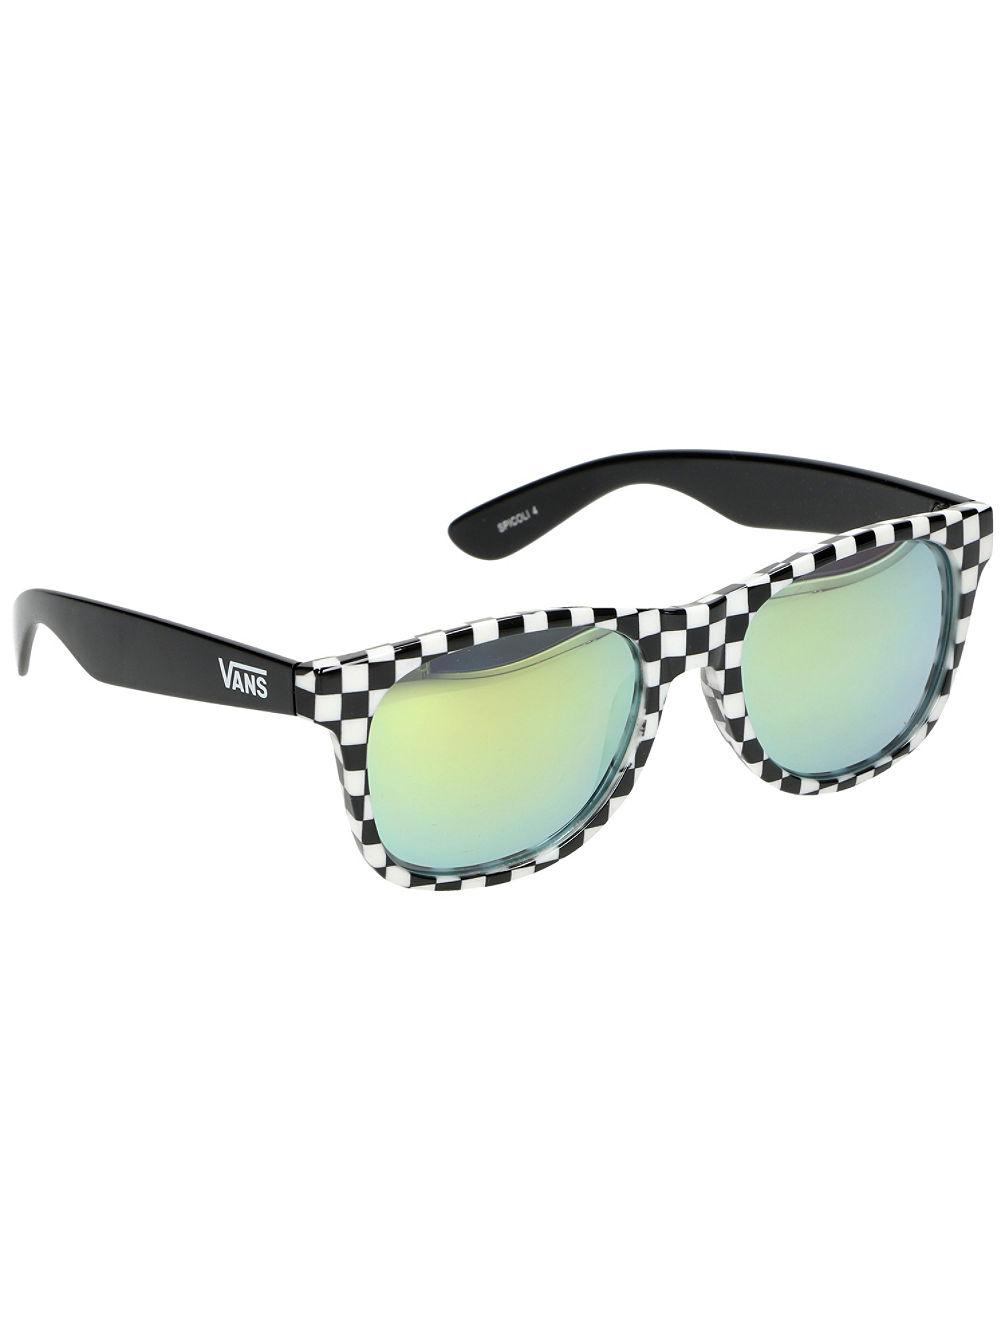 26080d26e3 Compra Vans Spicoli 4 Black/White Check Gafas de Sol en línea en ...